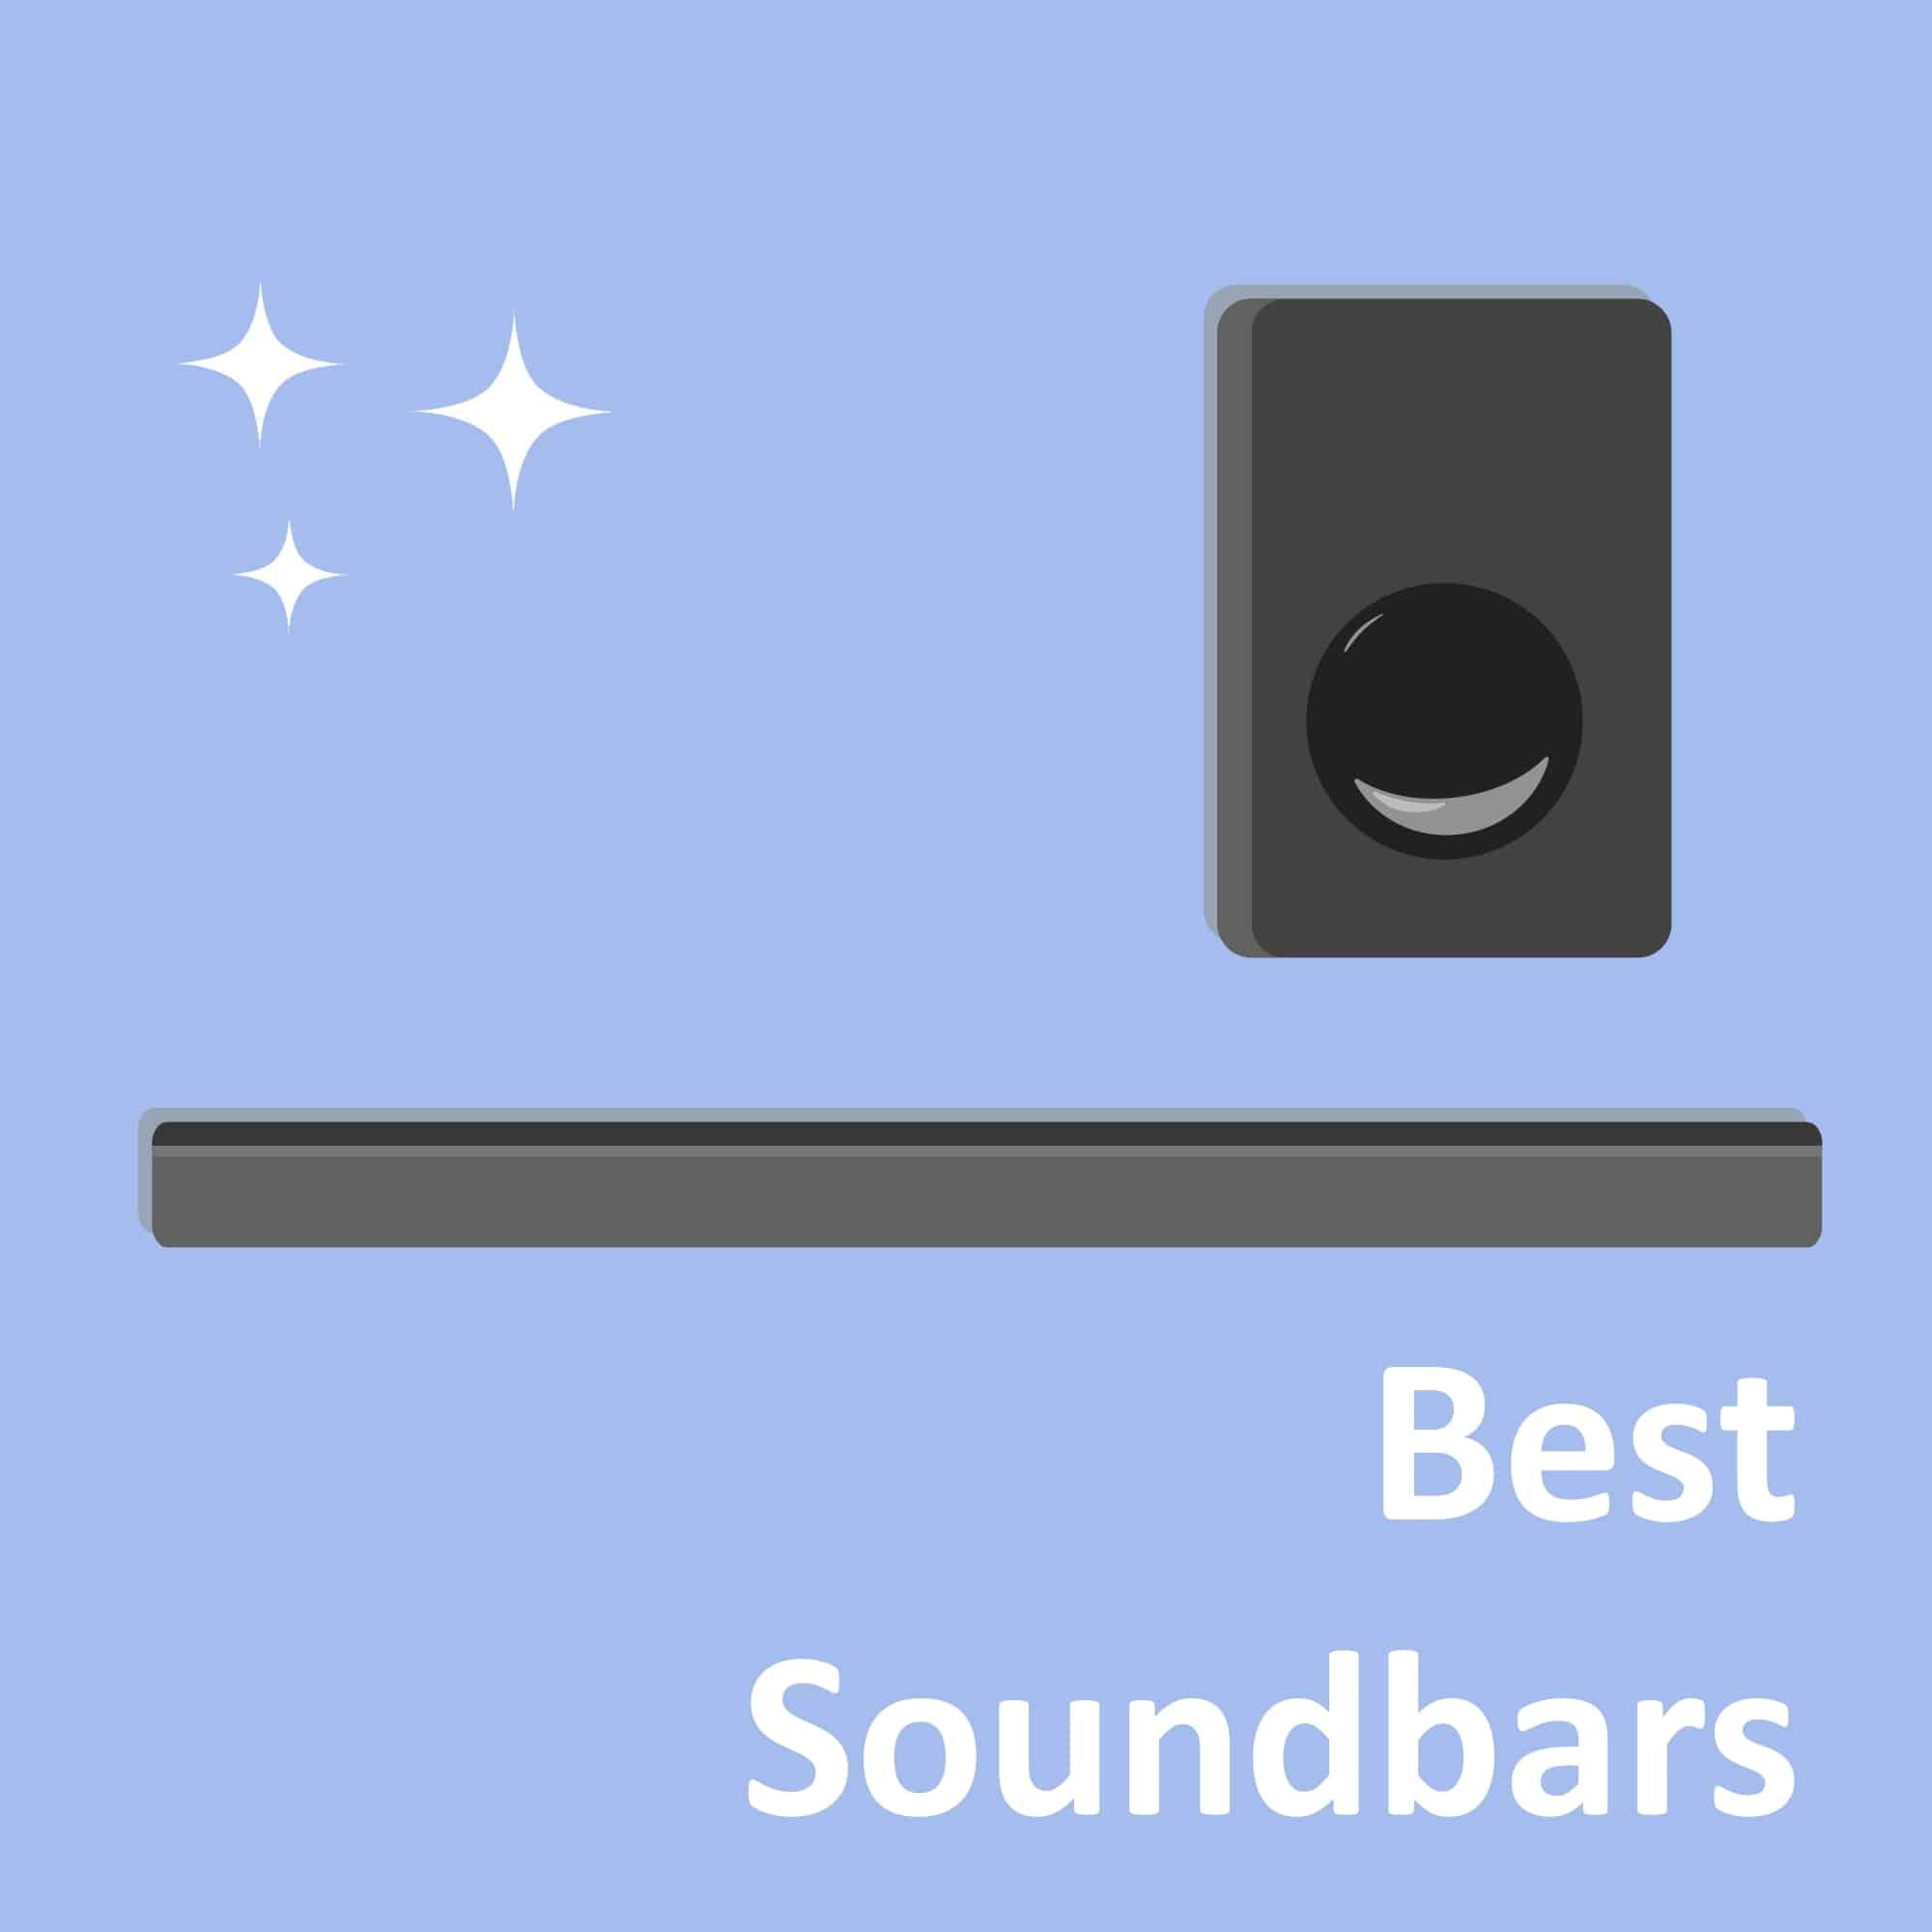 Top soundbar review 2018. Best soundbars from Sony, Samsung, Polk, Vizio and Yamaha